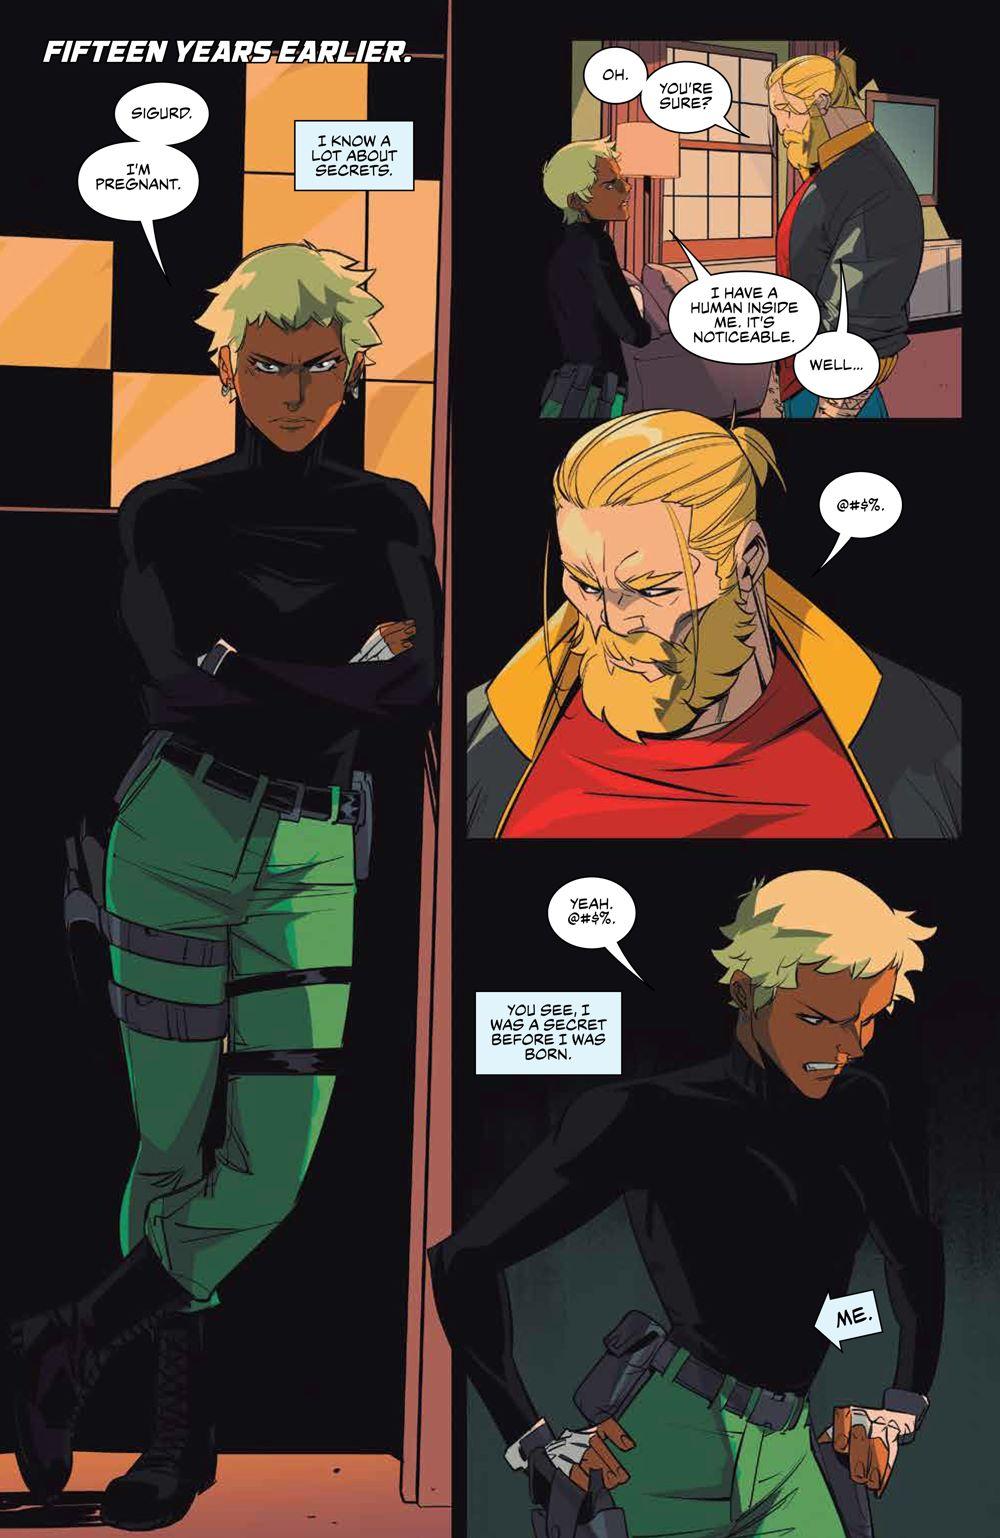 SevenSecrets_v1_SC_PRESS_16 ComicList Previews: SEVEN SECRETS VOLUME 1 TP